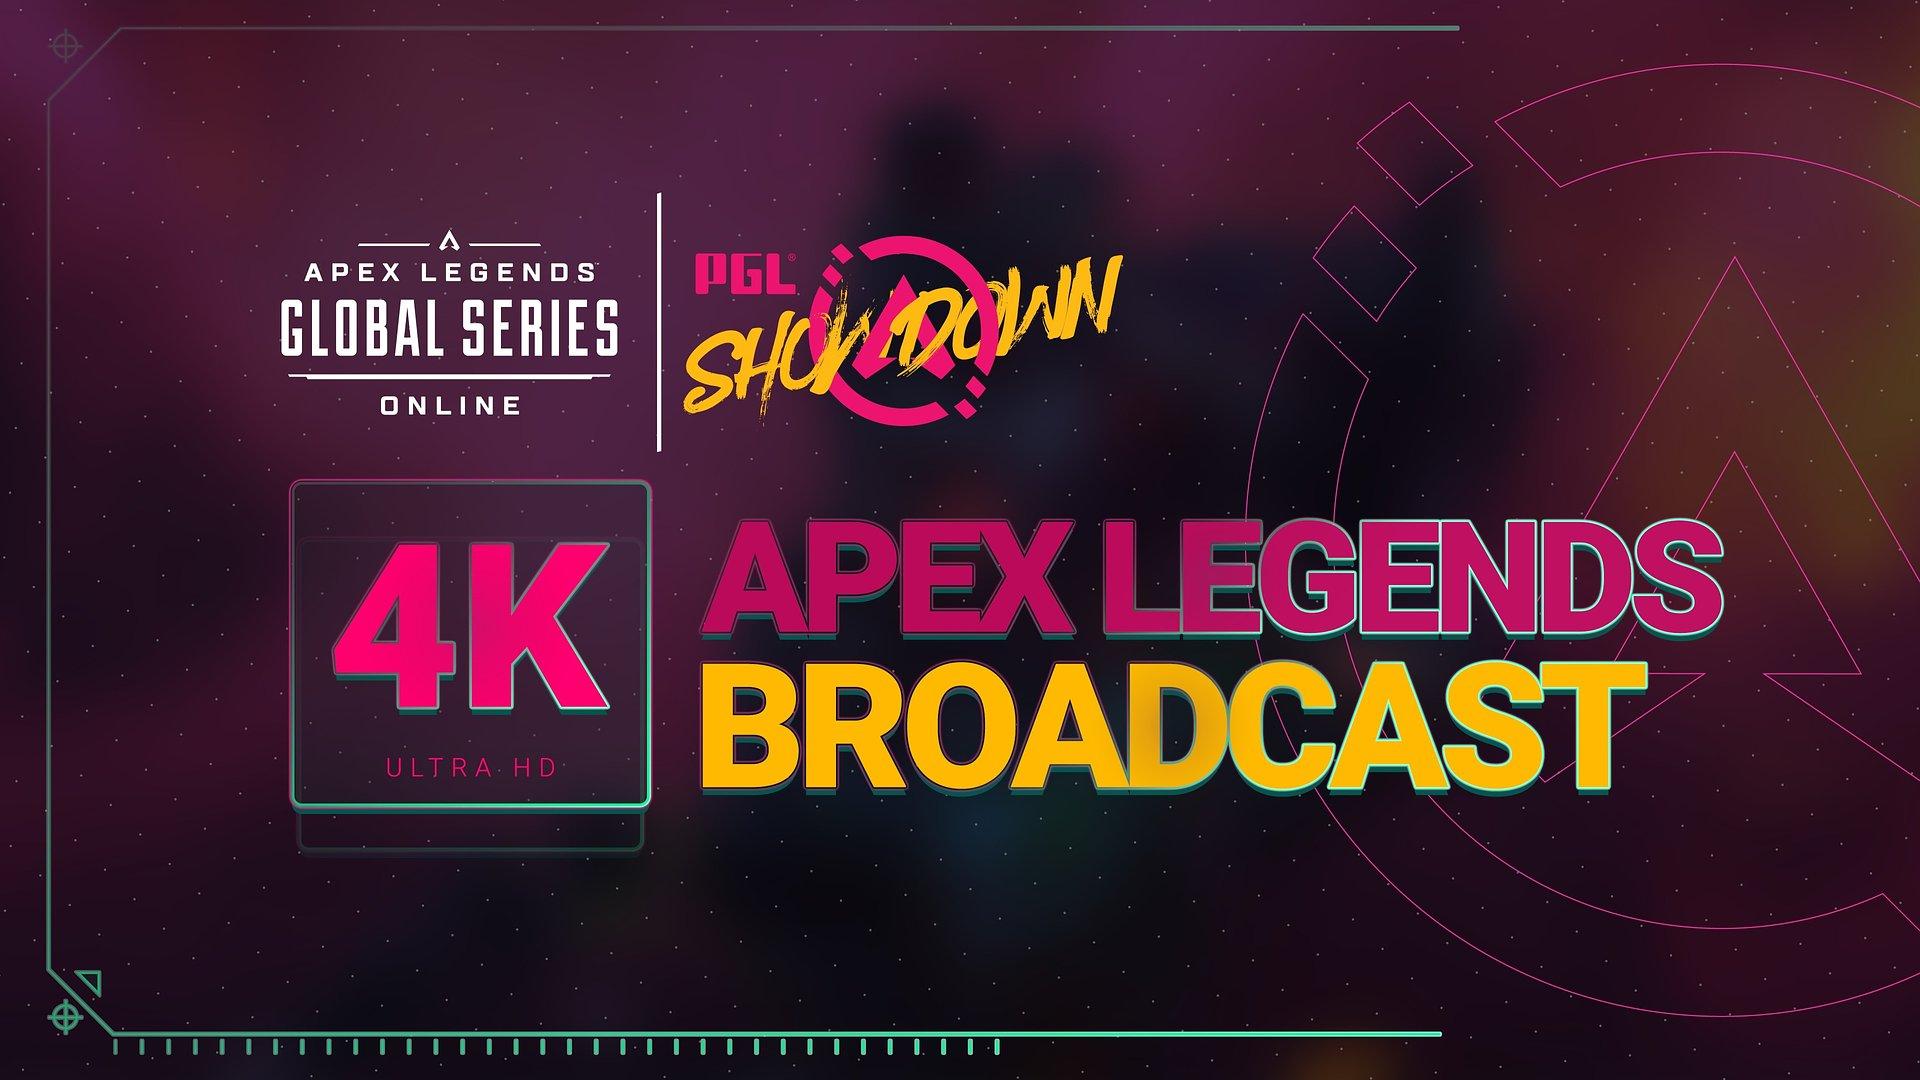 PGL APEX LEGENDS SHOWDOWN: world's first 4K Apex Legends broadcast, innovative AR, and in-depth stats